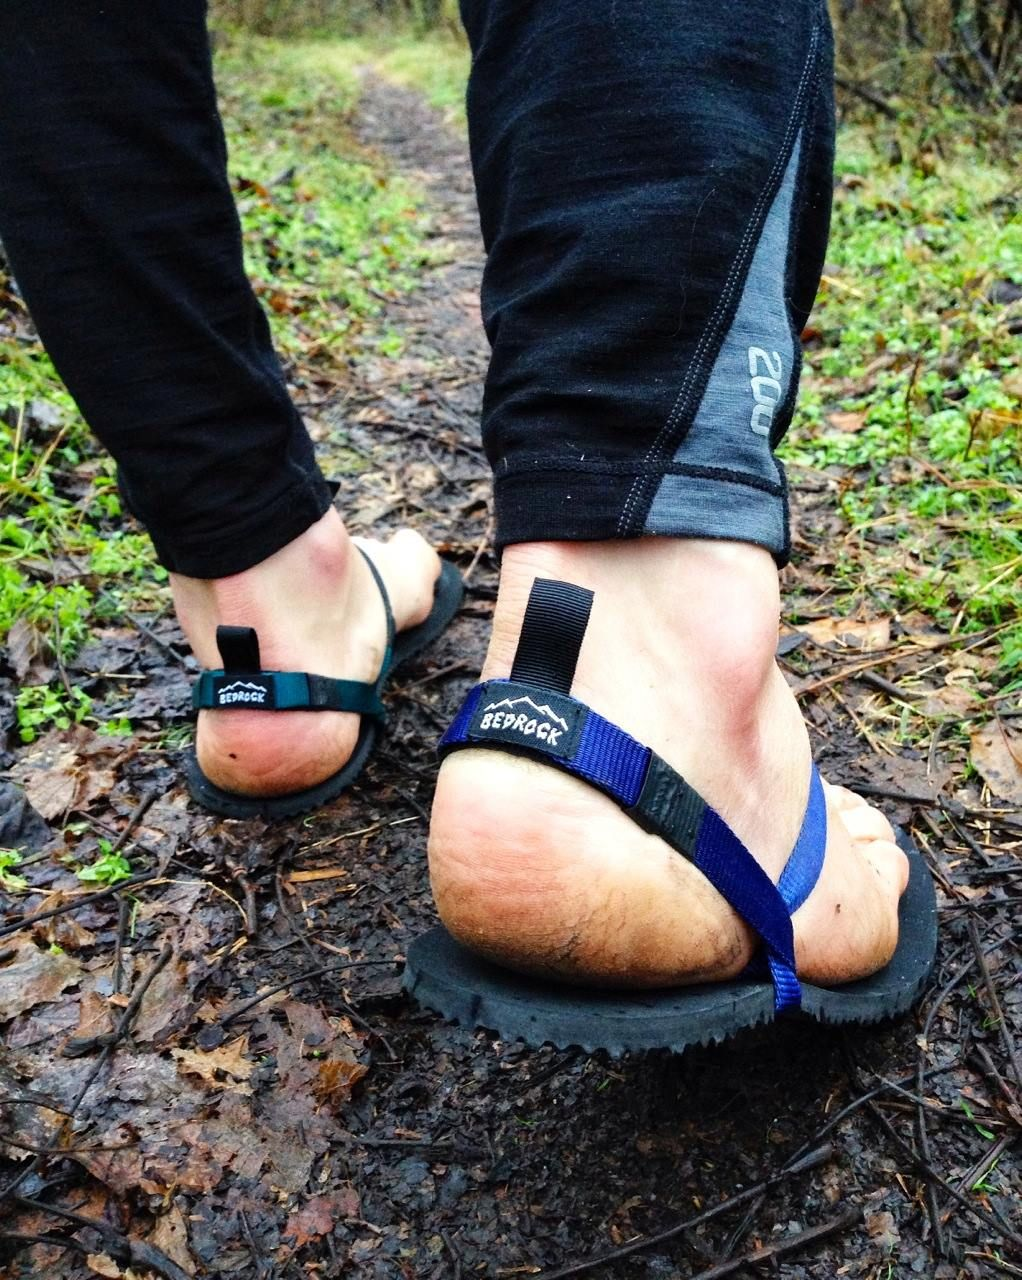 Bedrock Sandals Minimalist Outdoors Sandals Made In Usa Best Hiking Shoes Trekking Sandals Runners Sandals